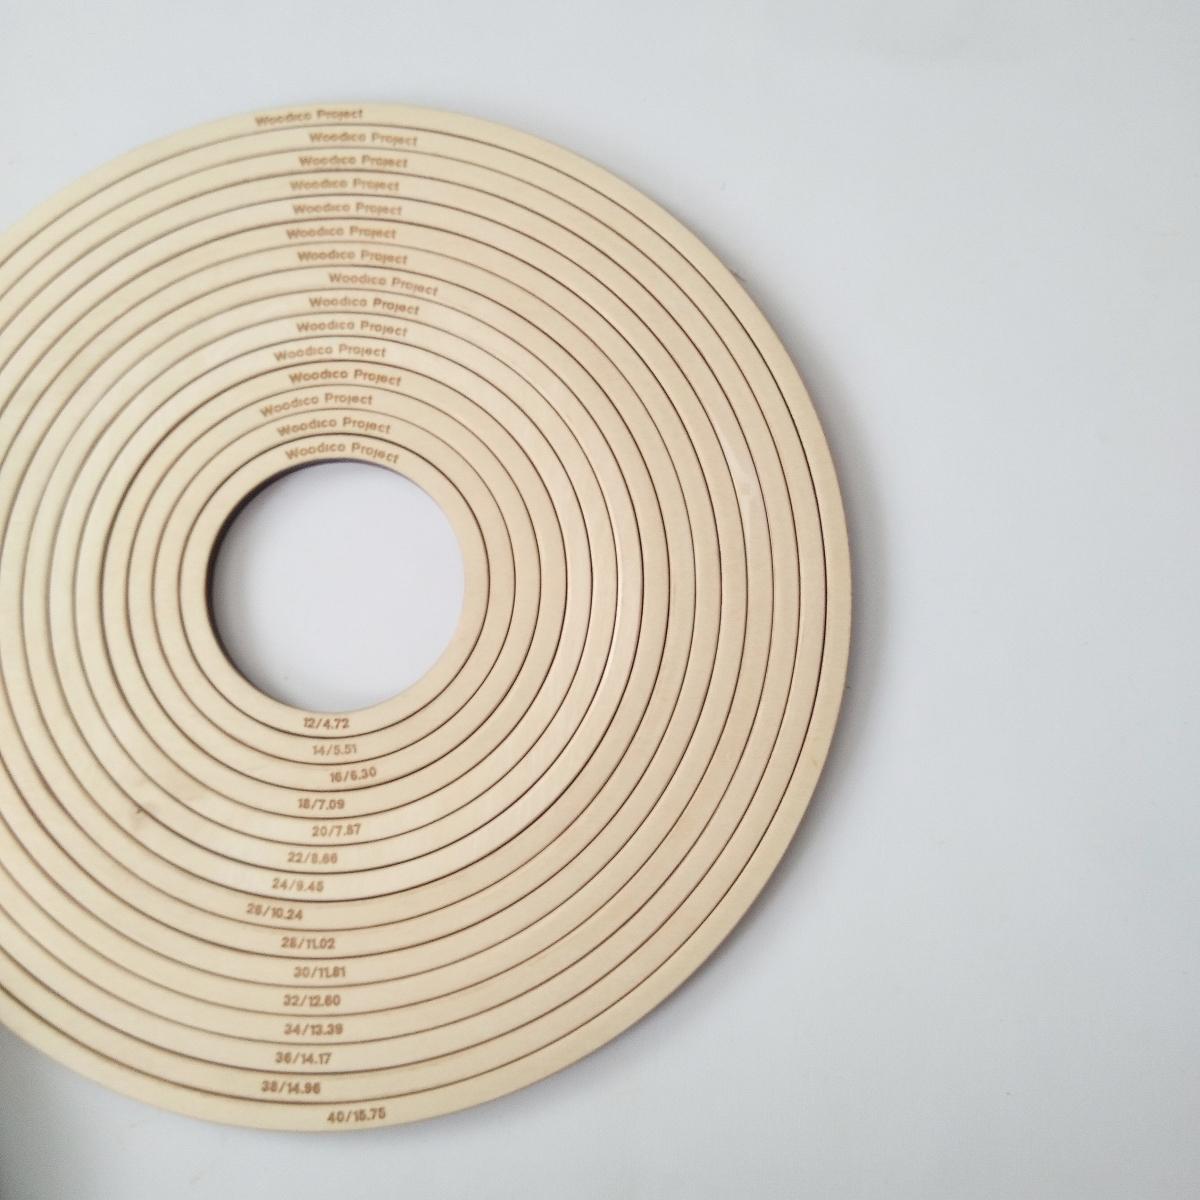 woodico.pro dream catcher base set of 15 rings 12 40 cm 19 1200x1200 - Dream catcher base / Set of 15 rings 12-40 cm